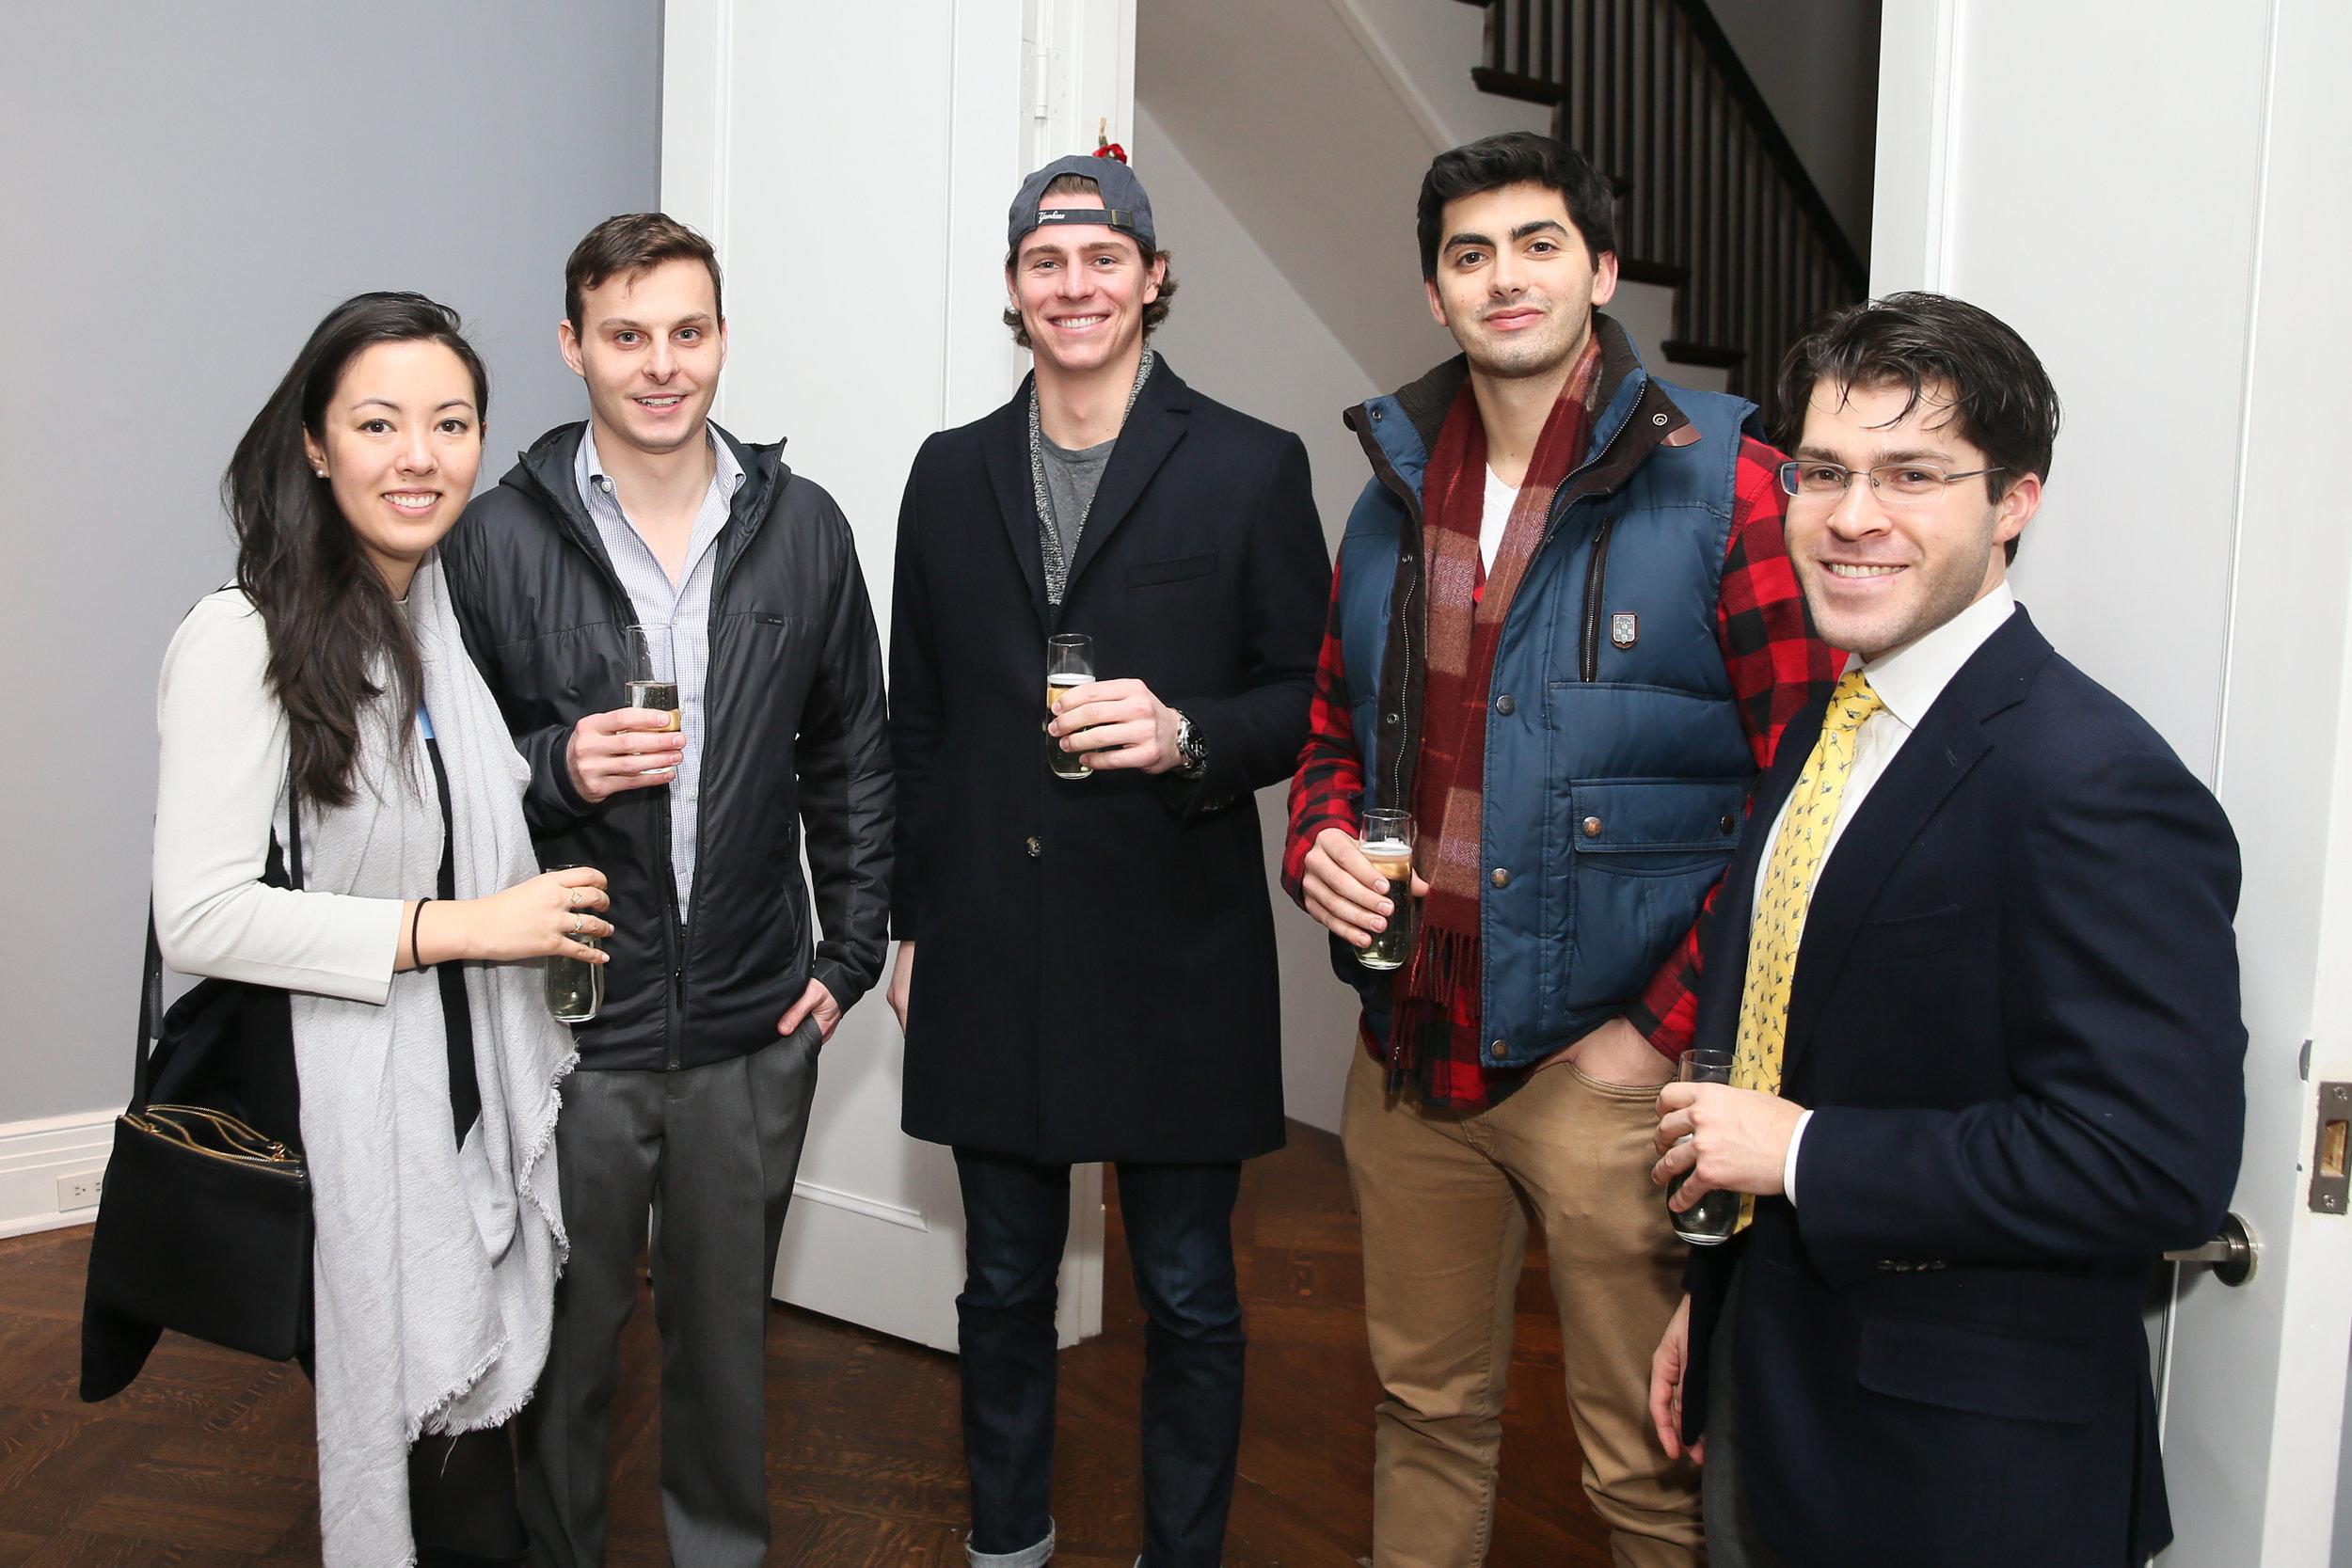 From left: Vicki Morton, Mason Krause, Jack Lorge, Teddy Nass, Ethan Goldstein.Photo credit: Noa Griffel for BFA